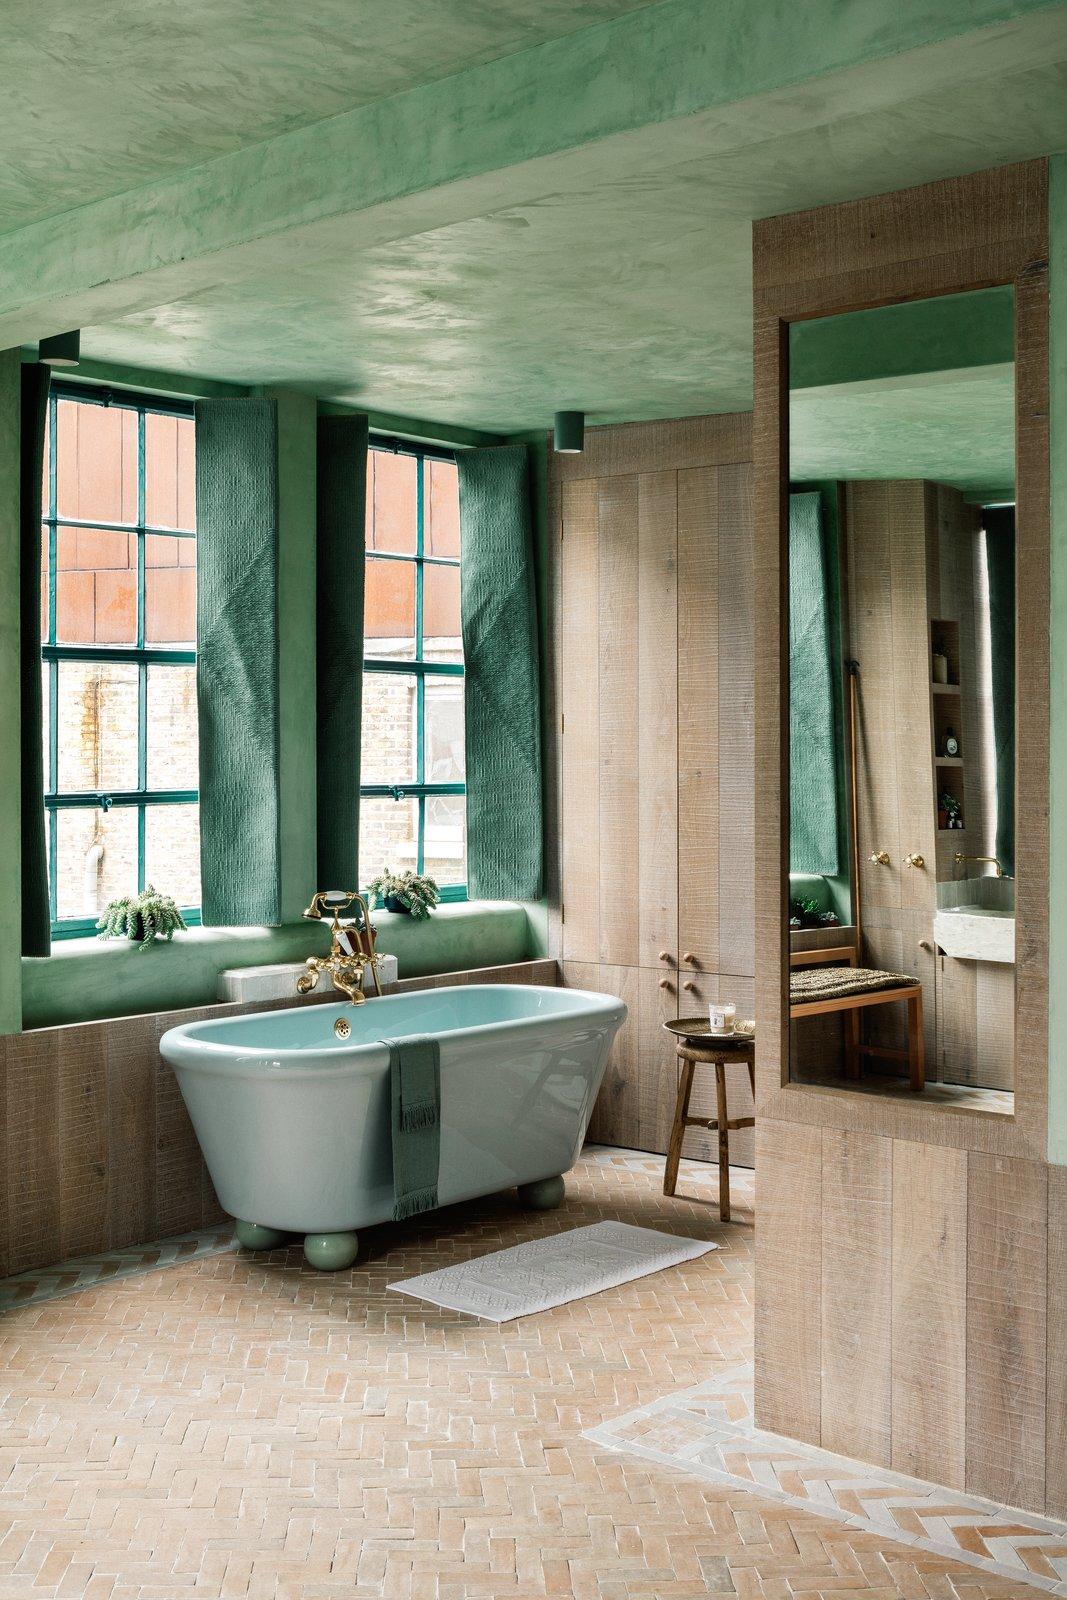 The Beldi Chan + Eayrs bathroom